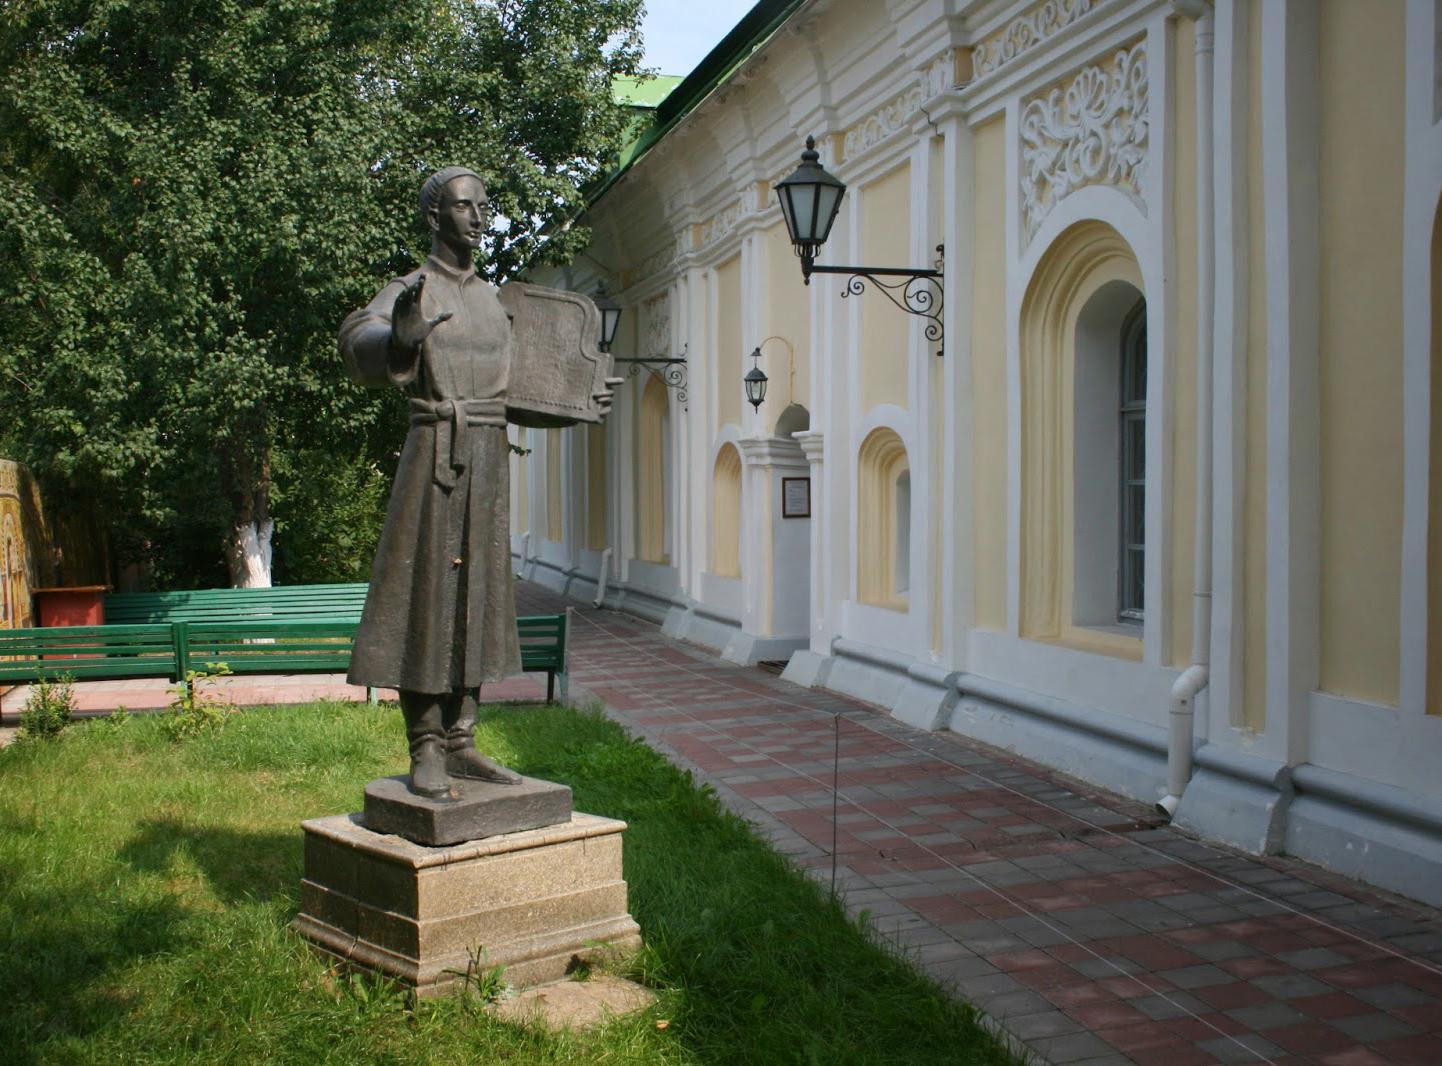 2-15 Переяславу-Хмельницькому повернуть історичну назву